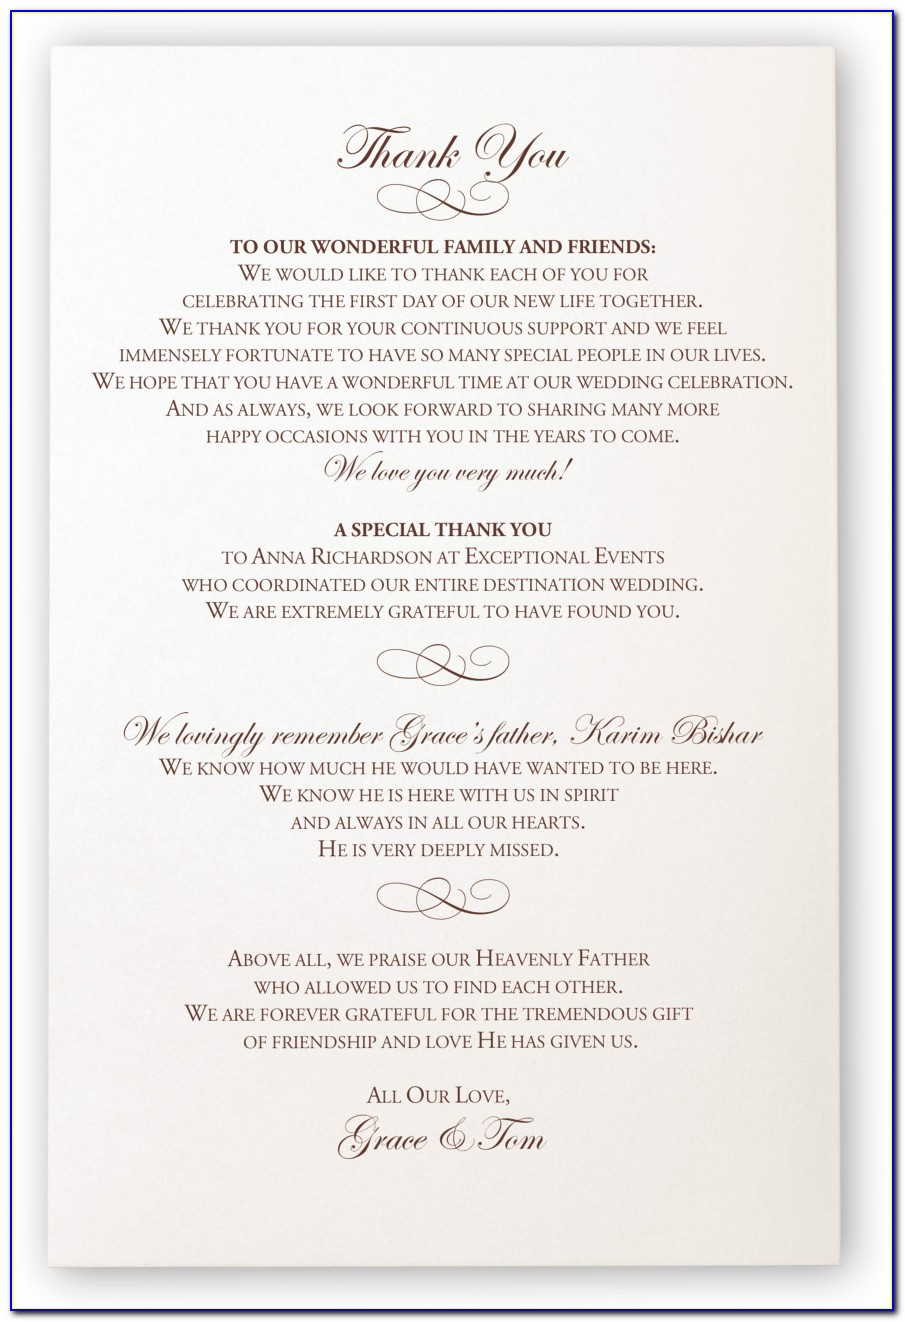 Greek Orthodox Wedding Ceremony Program Wording